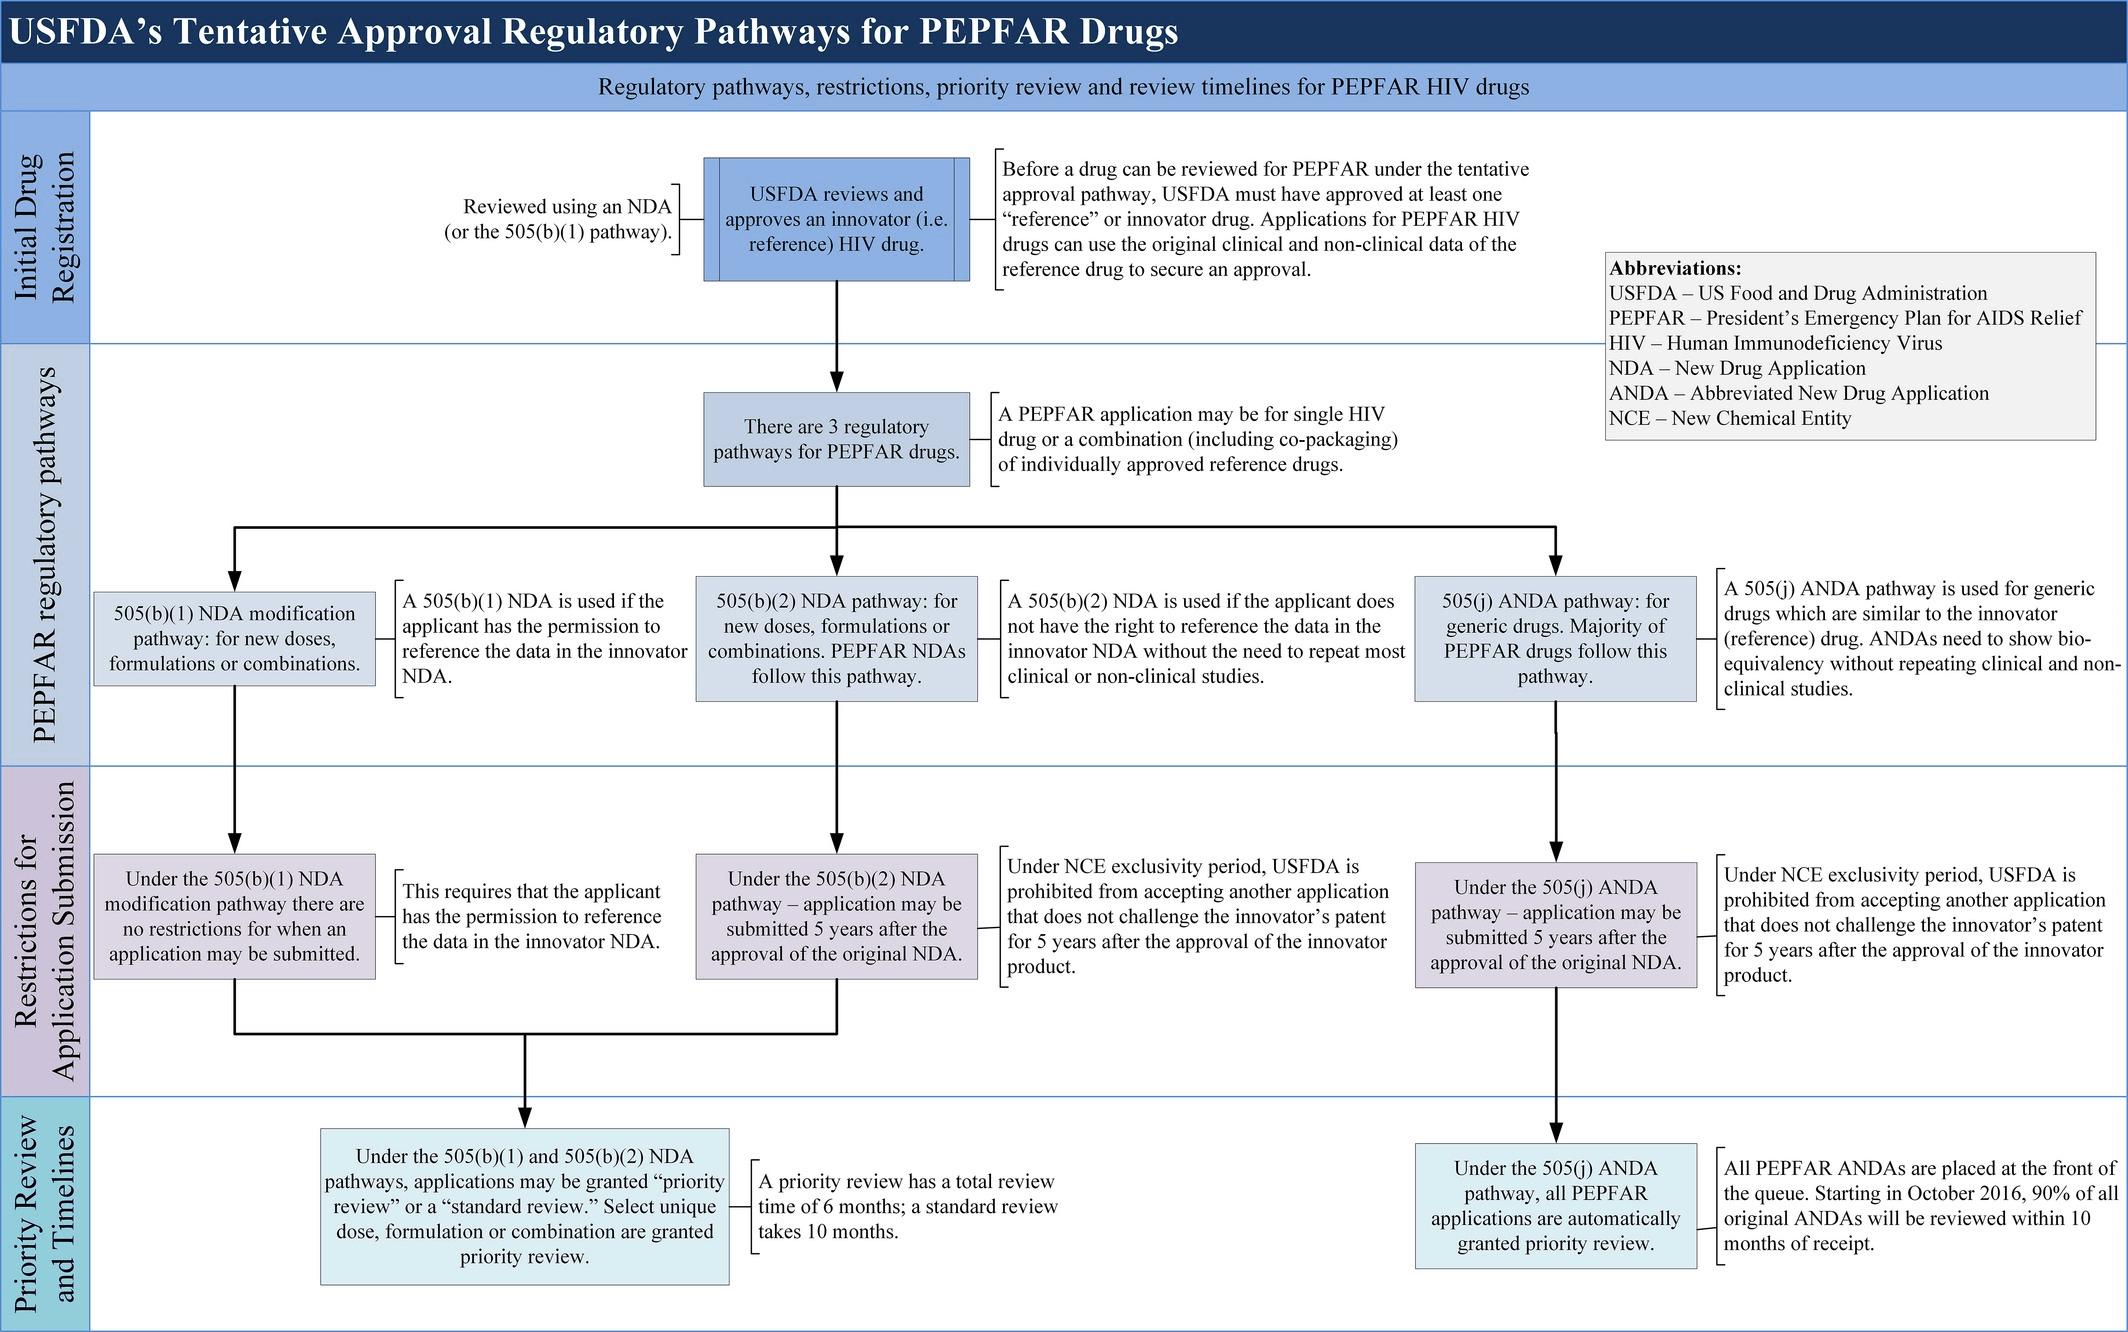 Figure 2 USFDA's tentative approval regulatory pathways for